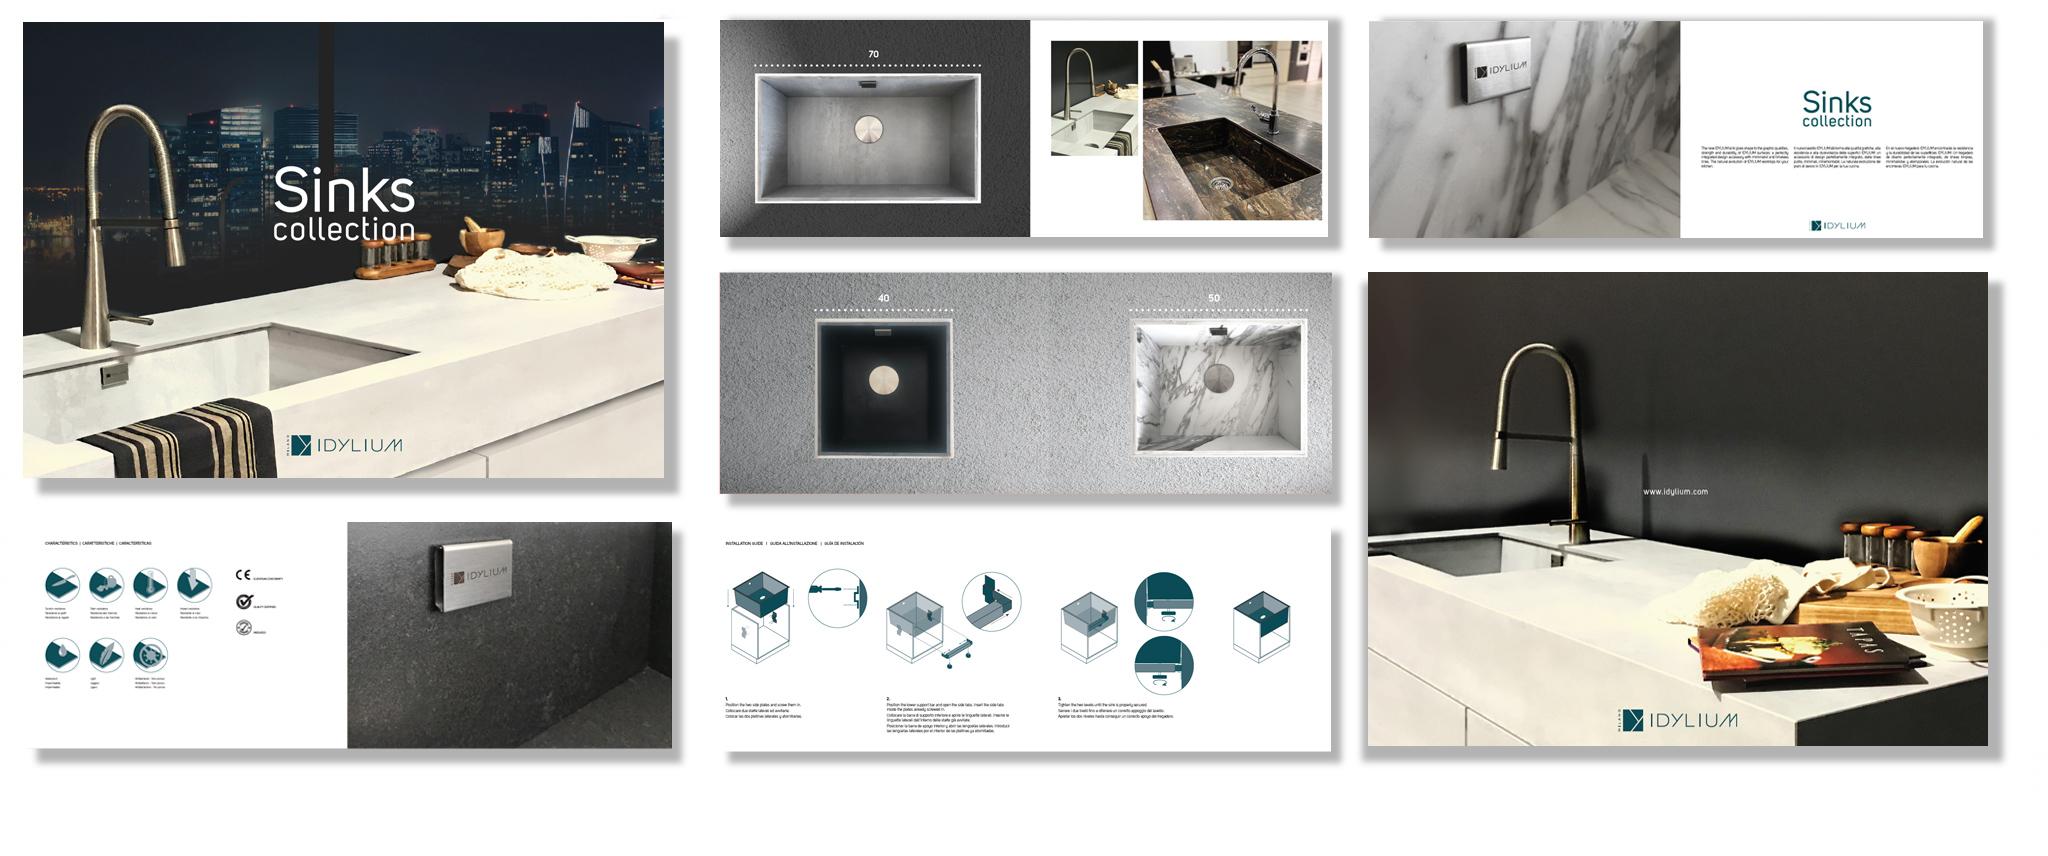 Idylium integrated SINKS catalogue